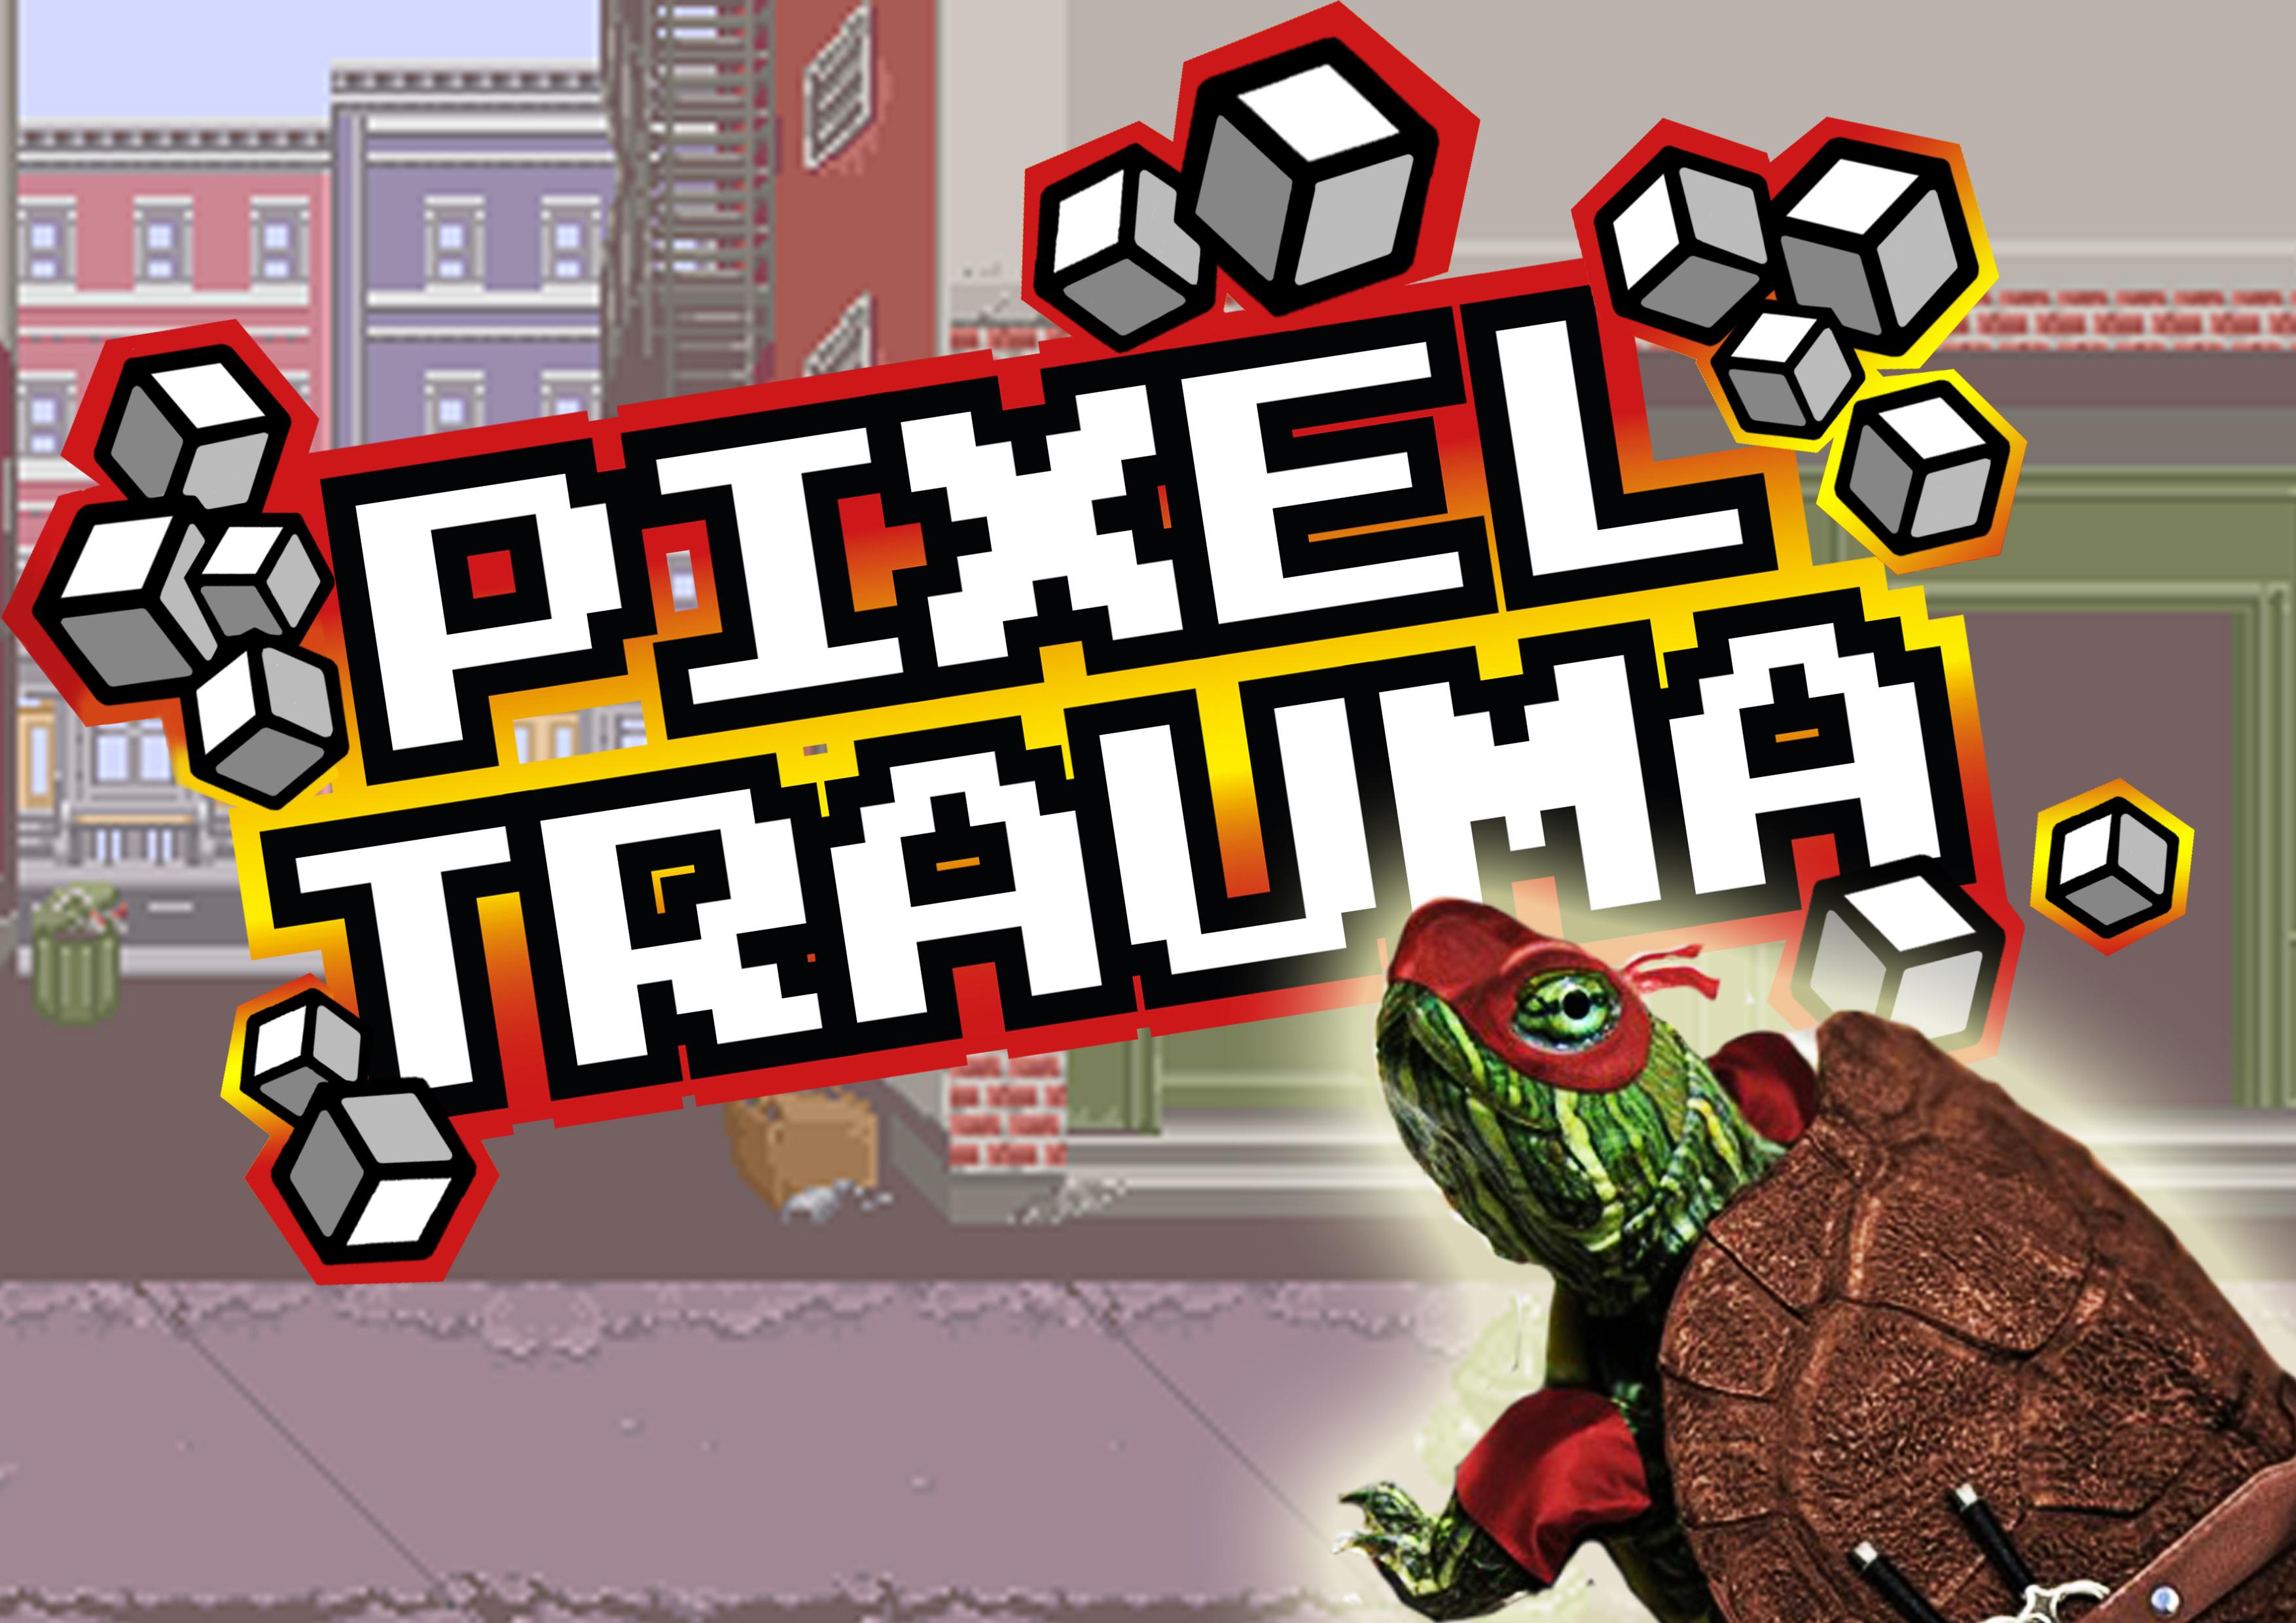 Pixeltrauma